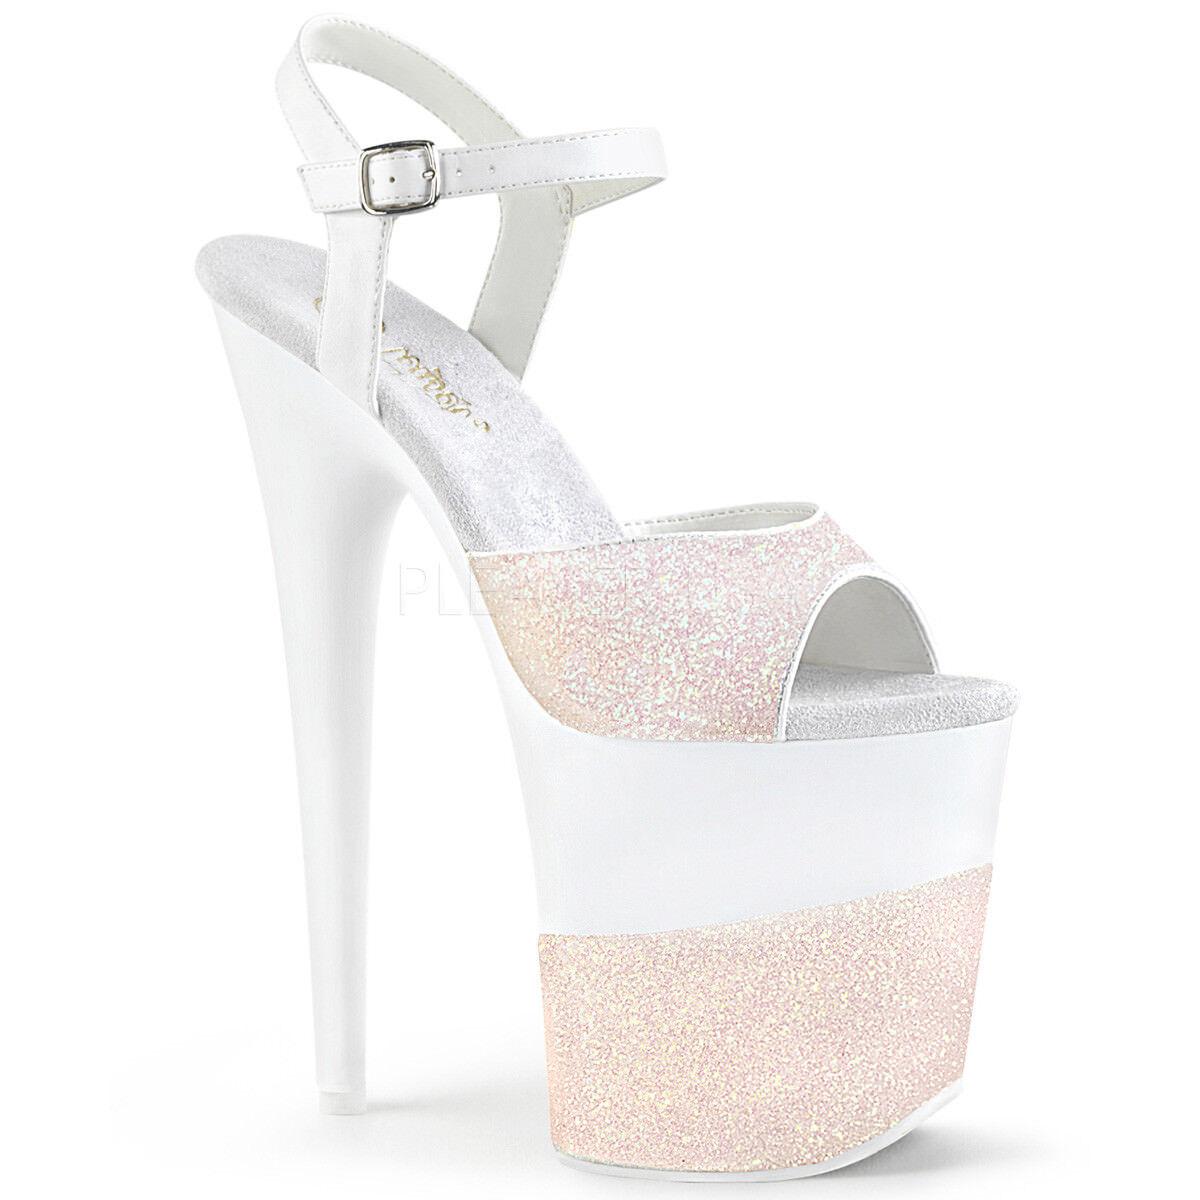 outlet online economico Pleaser FLAMINGO-809-2G Donna  Opal Glitter Heels Platform Platform Platform Ankle Strap Sandals  contatore genuino